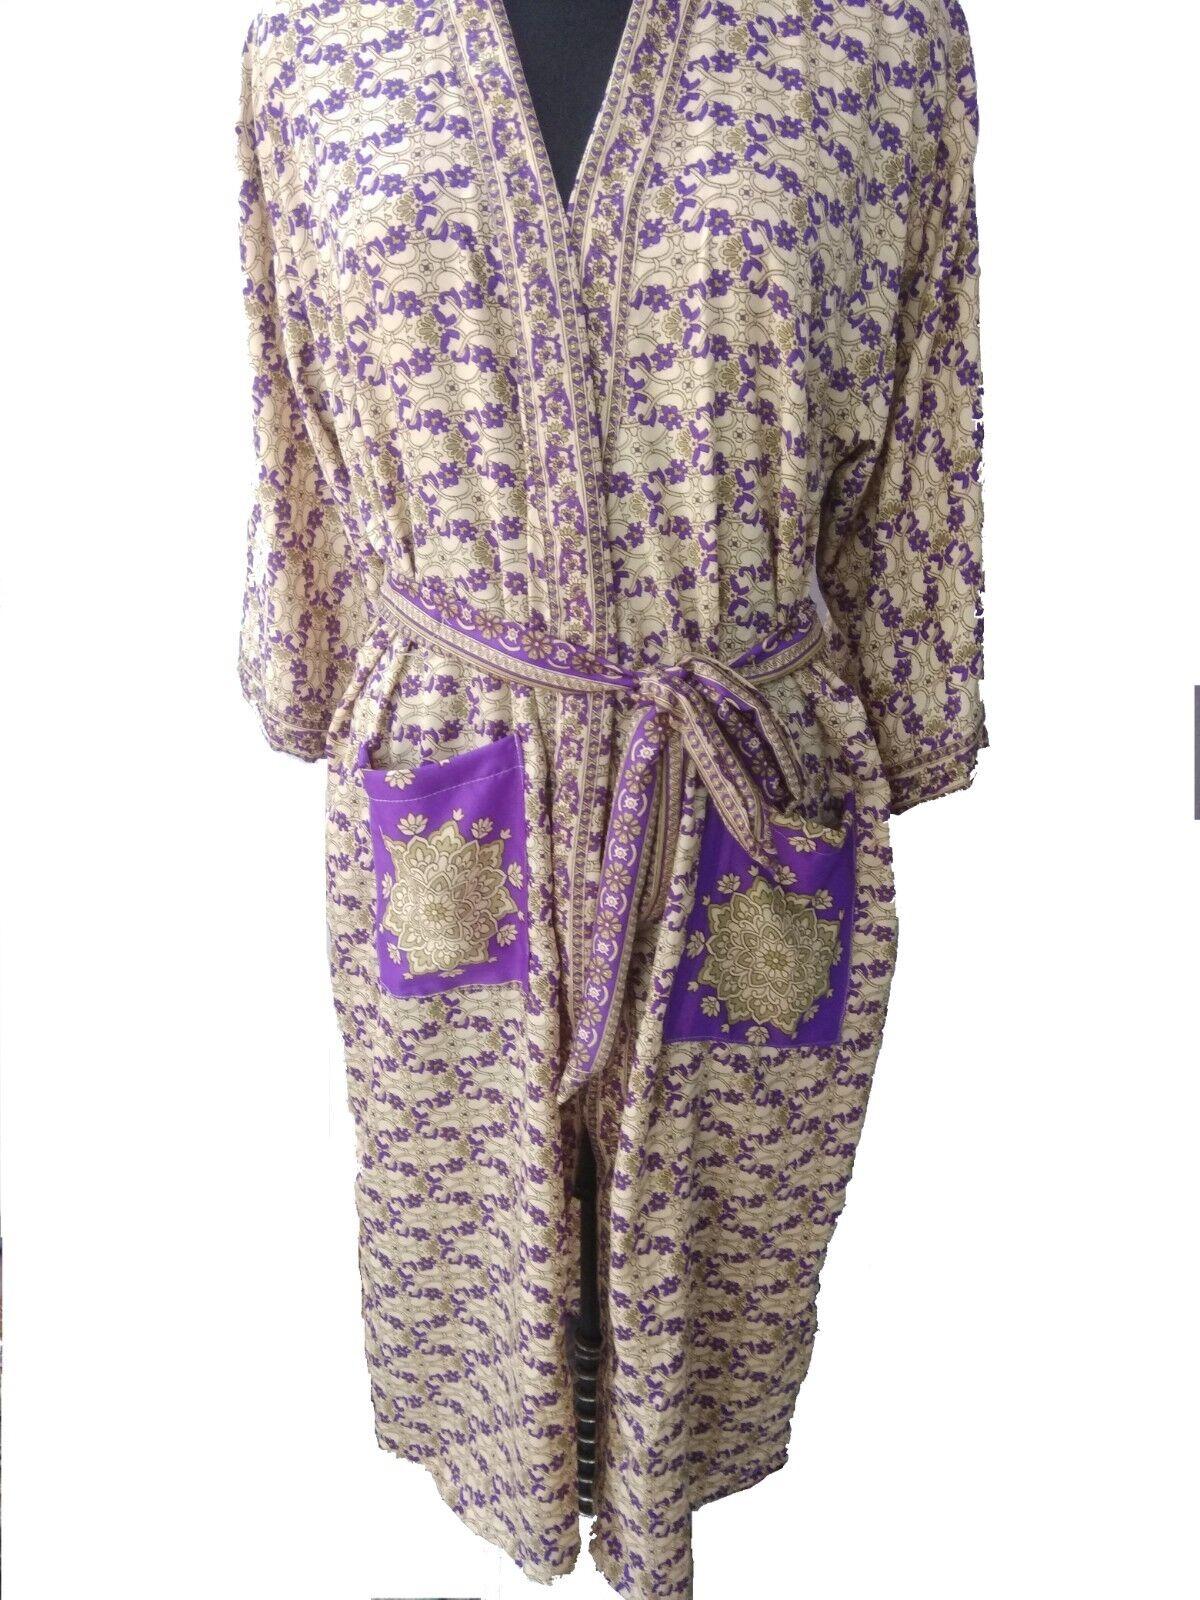 5Pc Indian Vintage Recycled Blend Silk Sari Women Wear Kimono Bathrobe Sleepwear